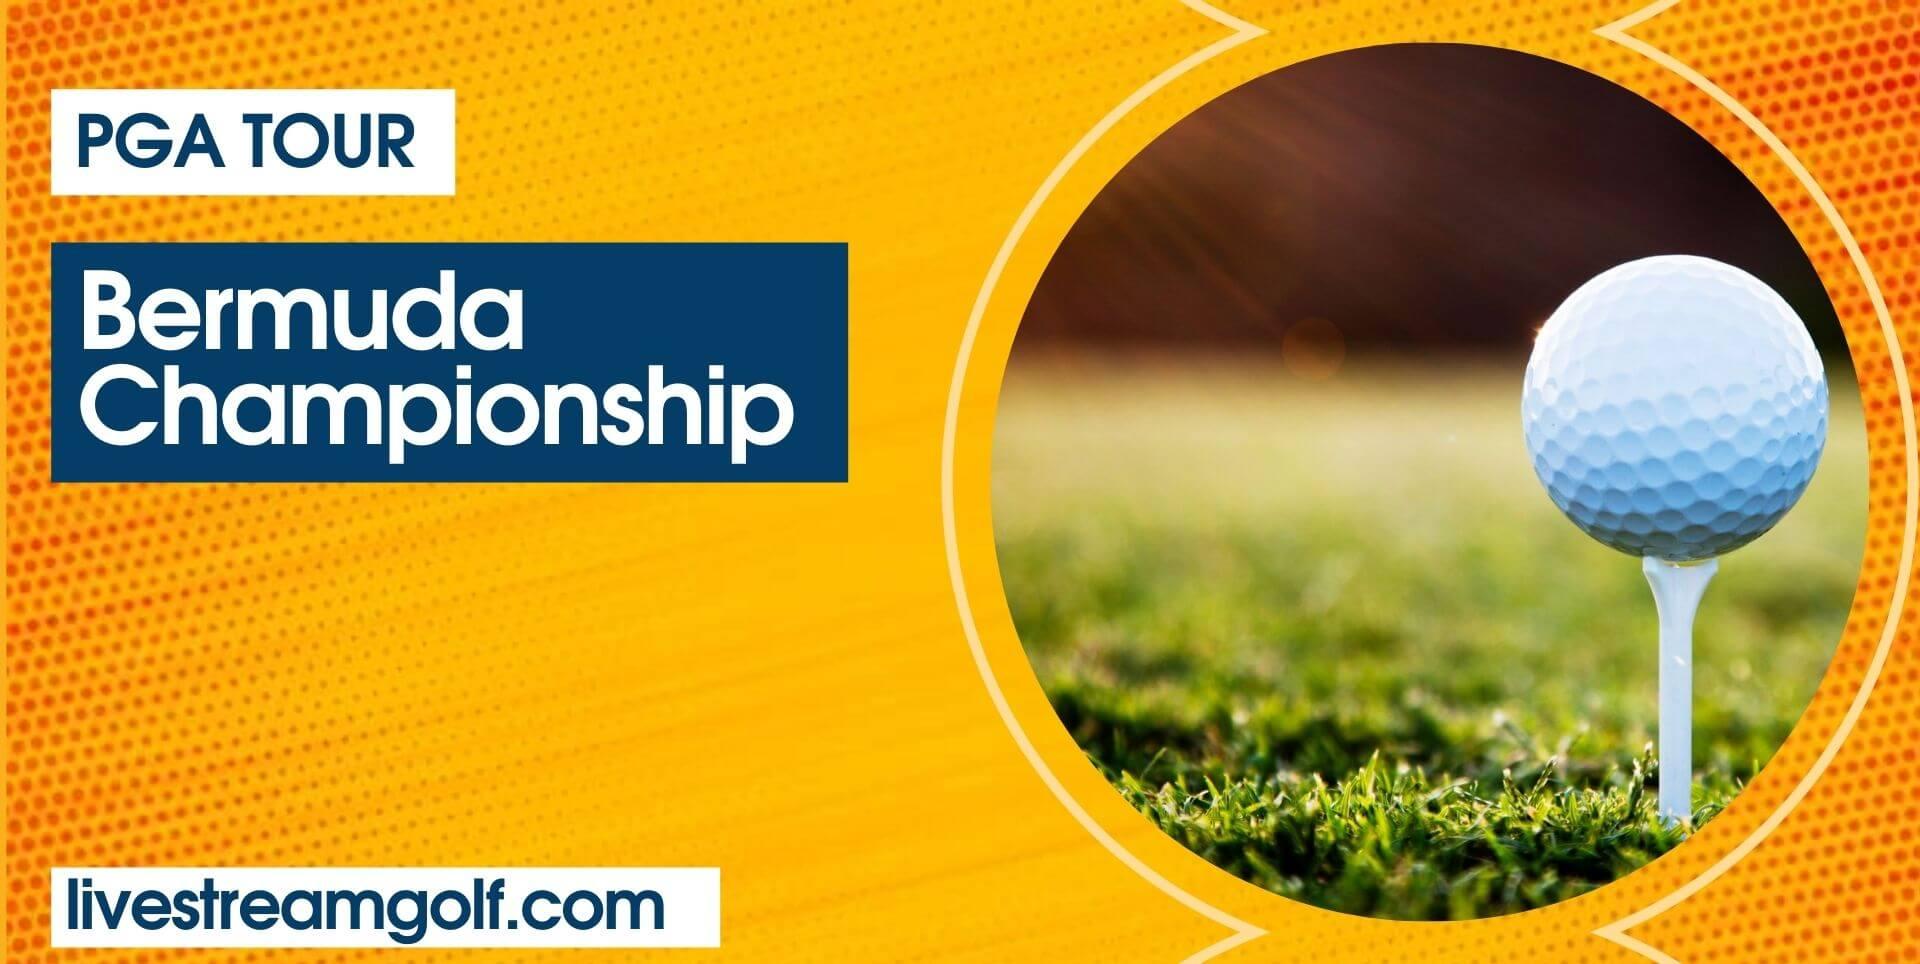 Bermuda Championship Rd 3 Live Stream: PGA Tour 2021